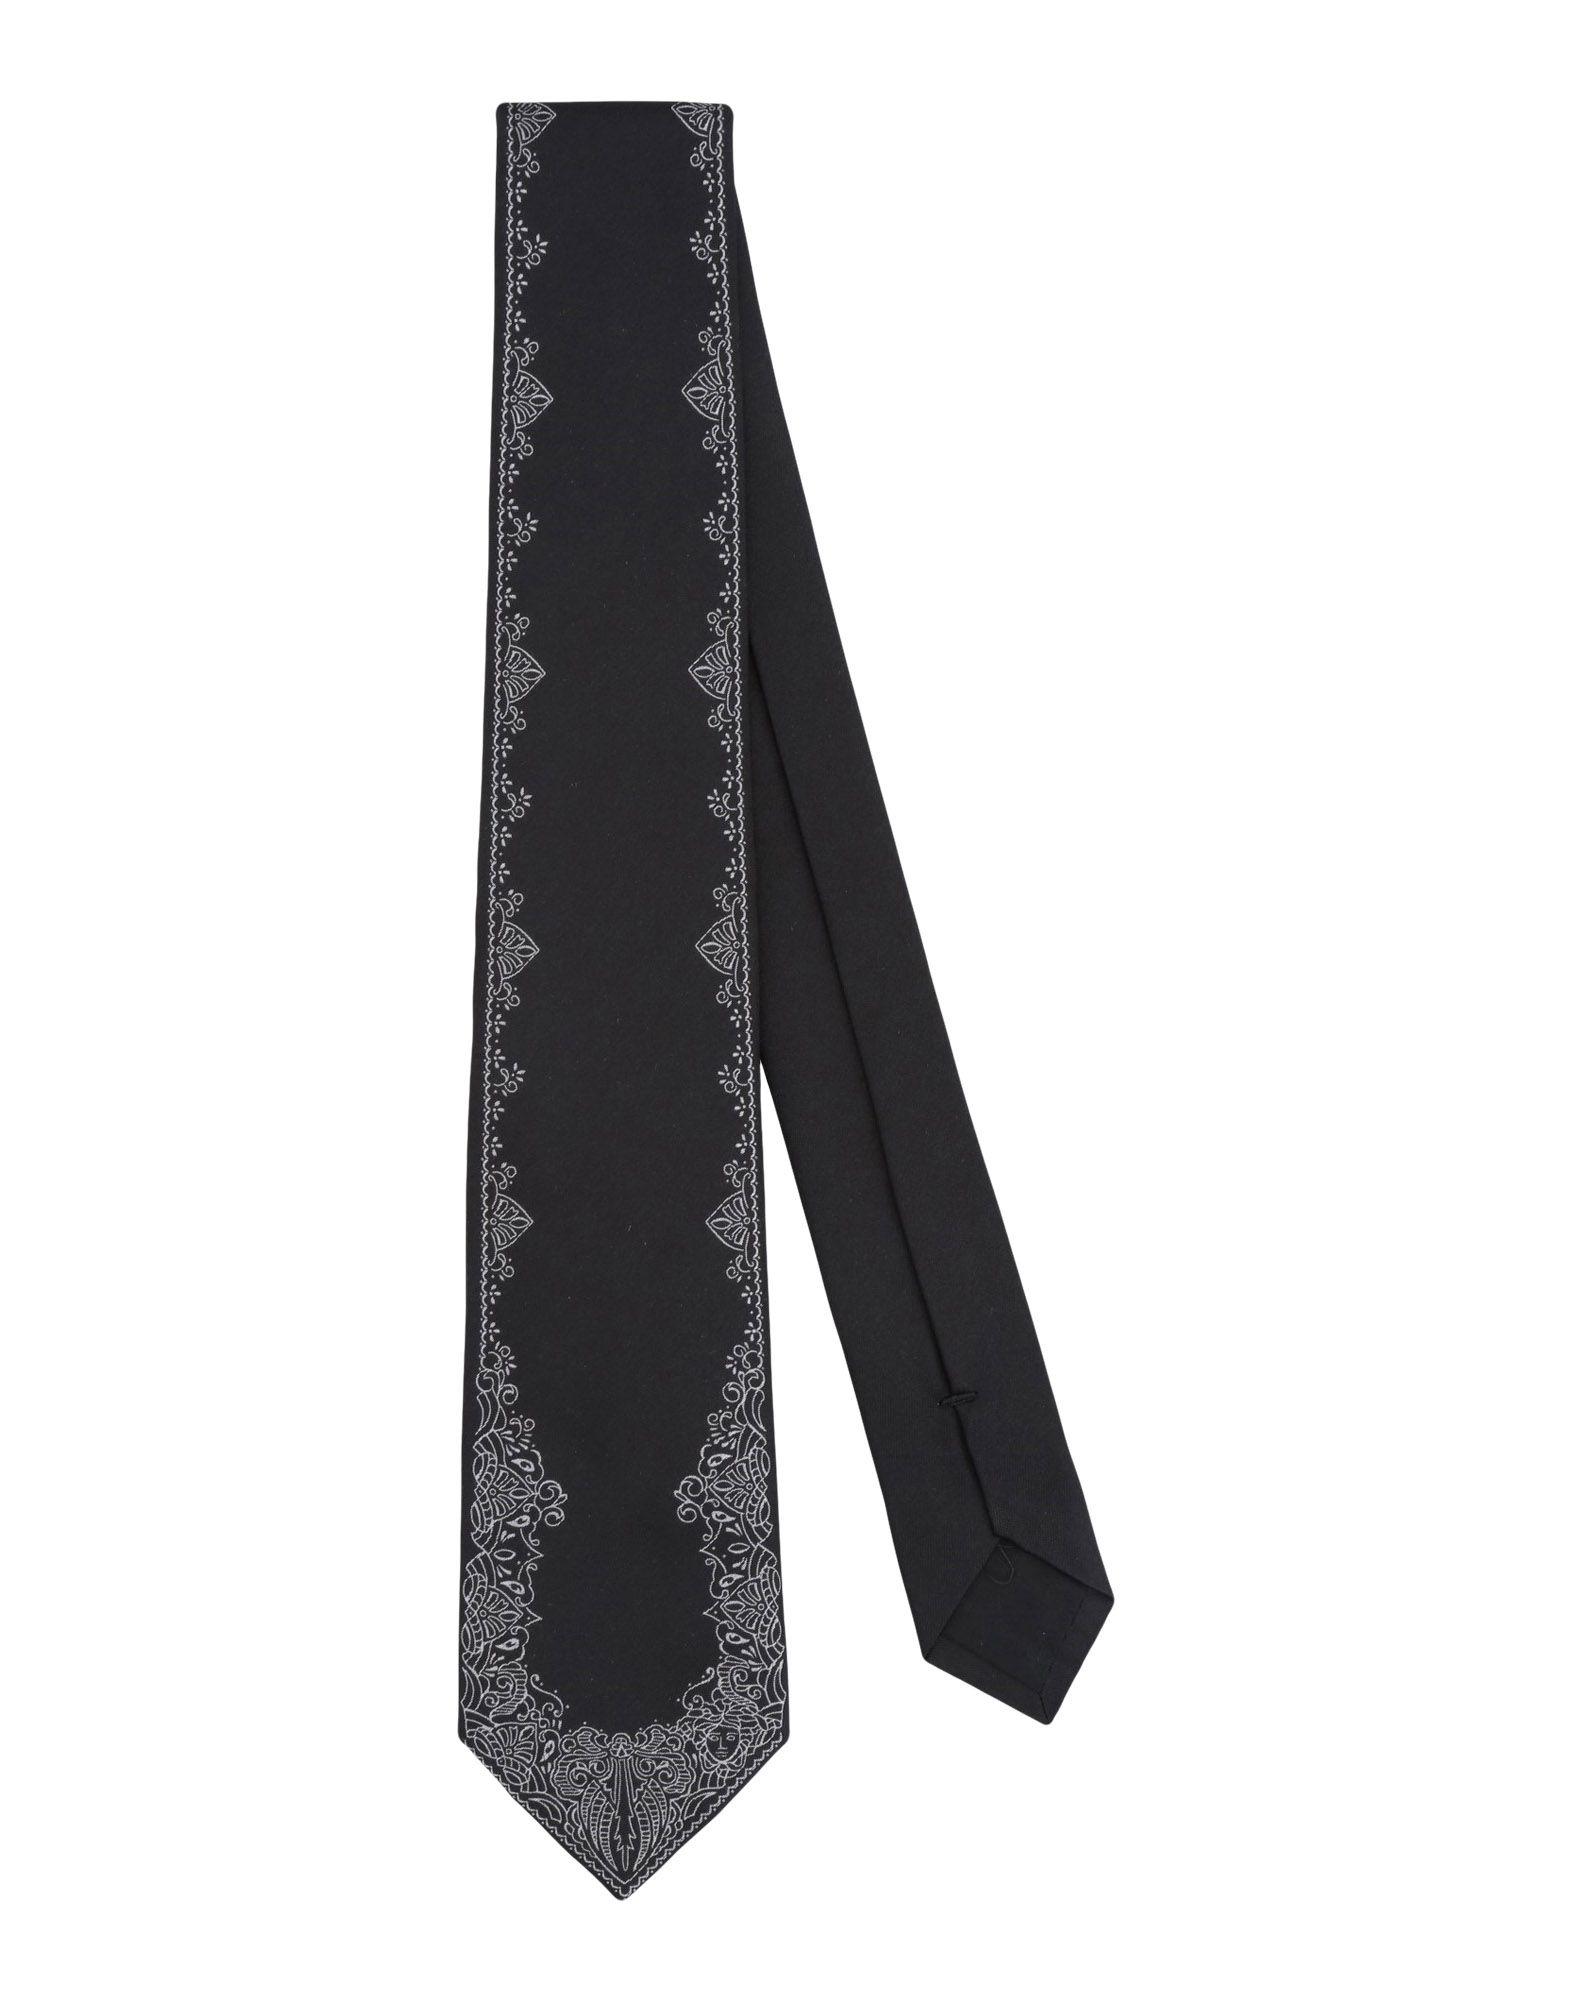 VERSACE Галстук versace бордовый галстук в клетку внизу с логотипом versace 821752 page 3